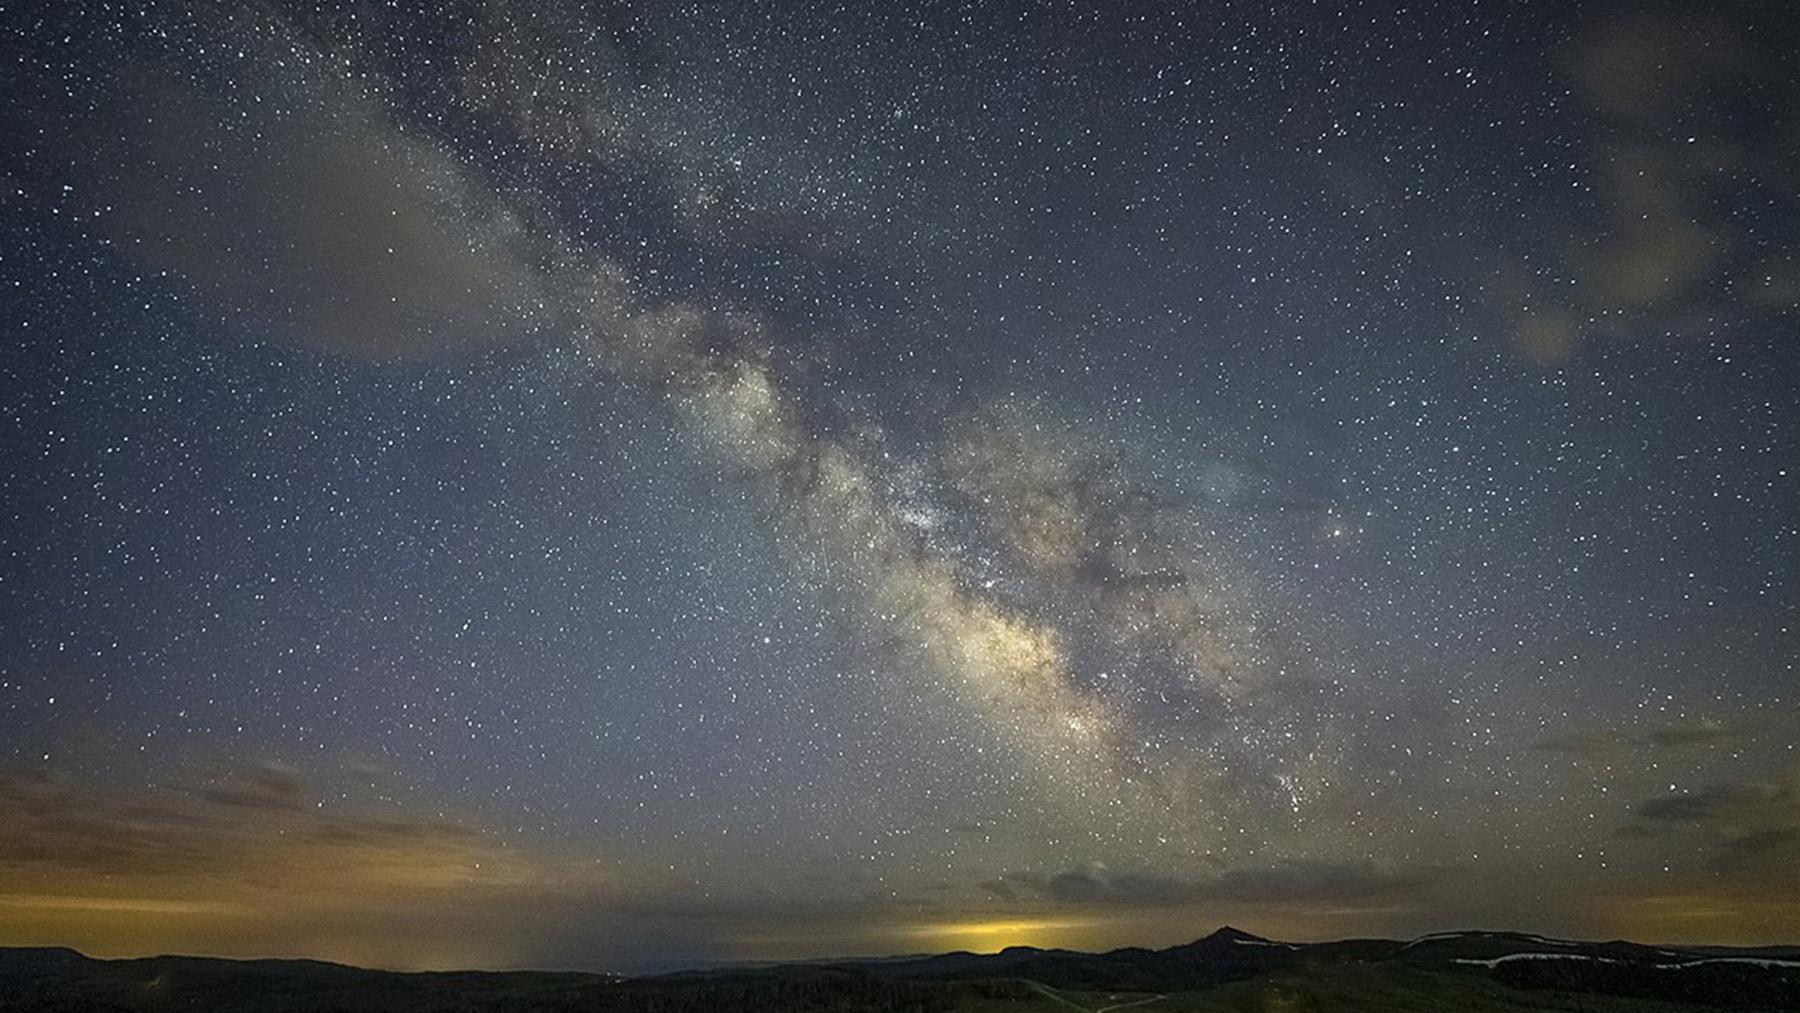 Milky Way. Photo by U.S. Forest Service